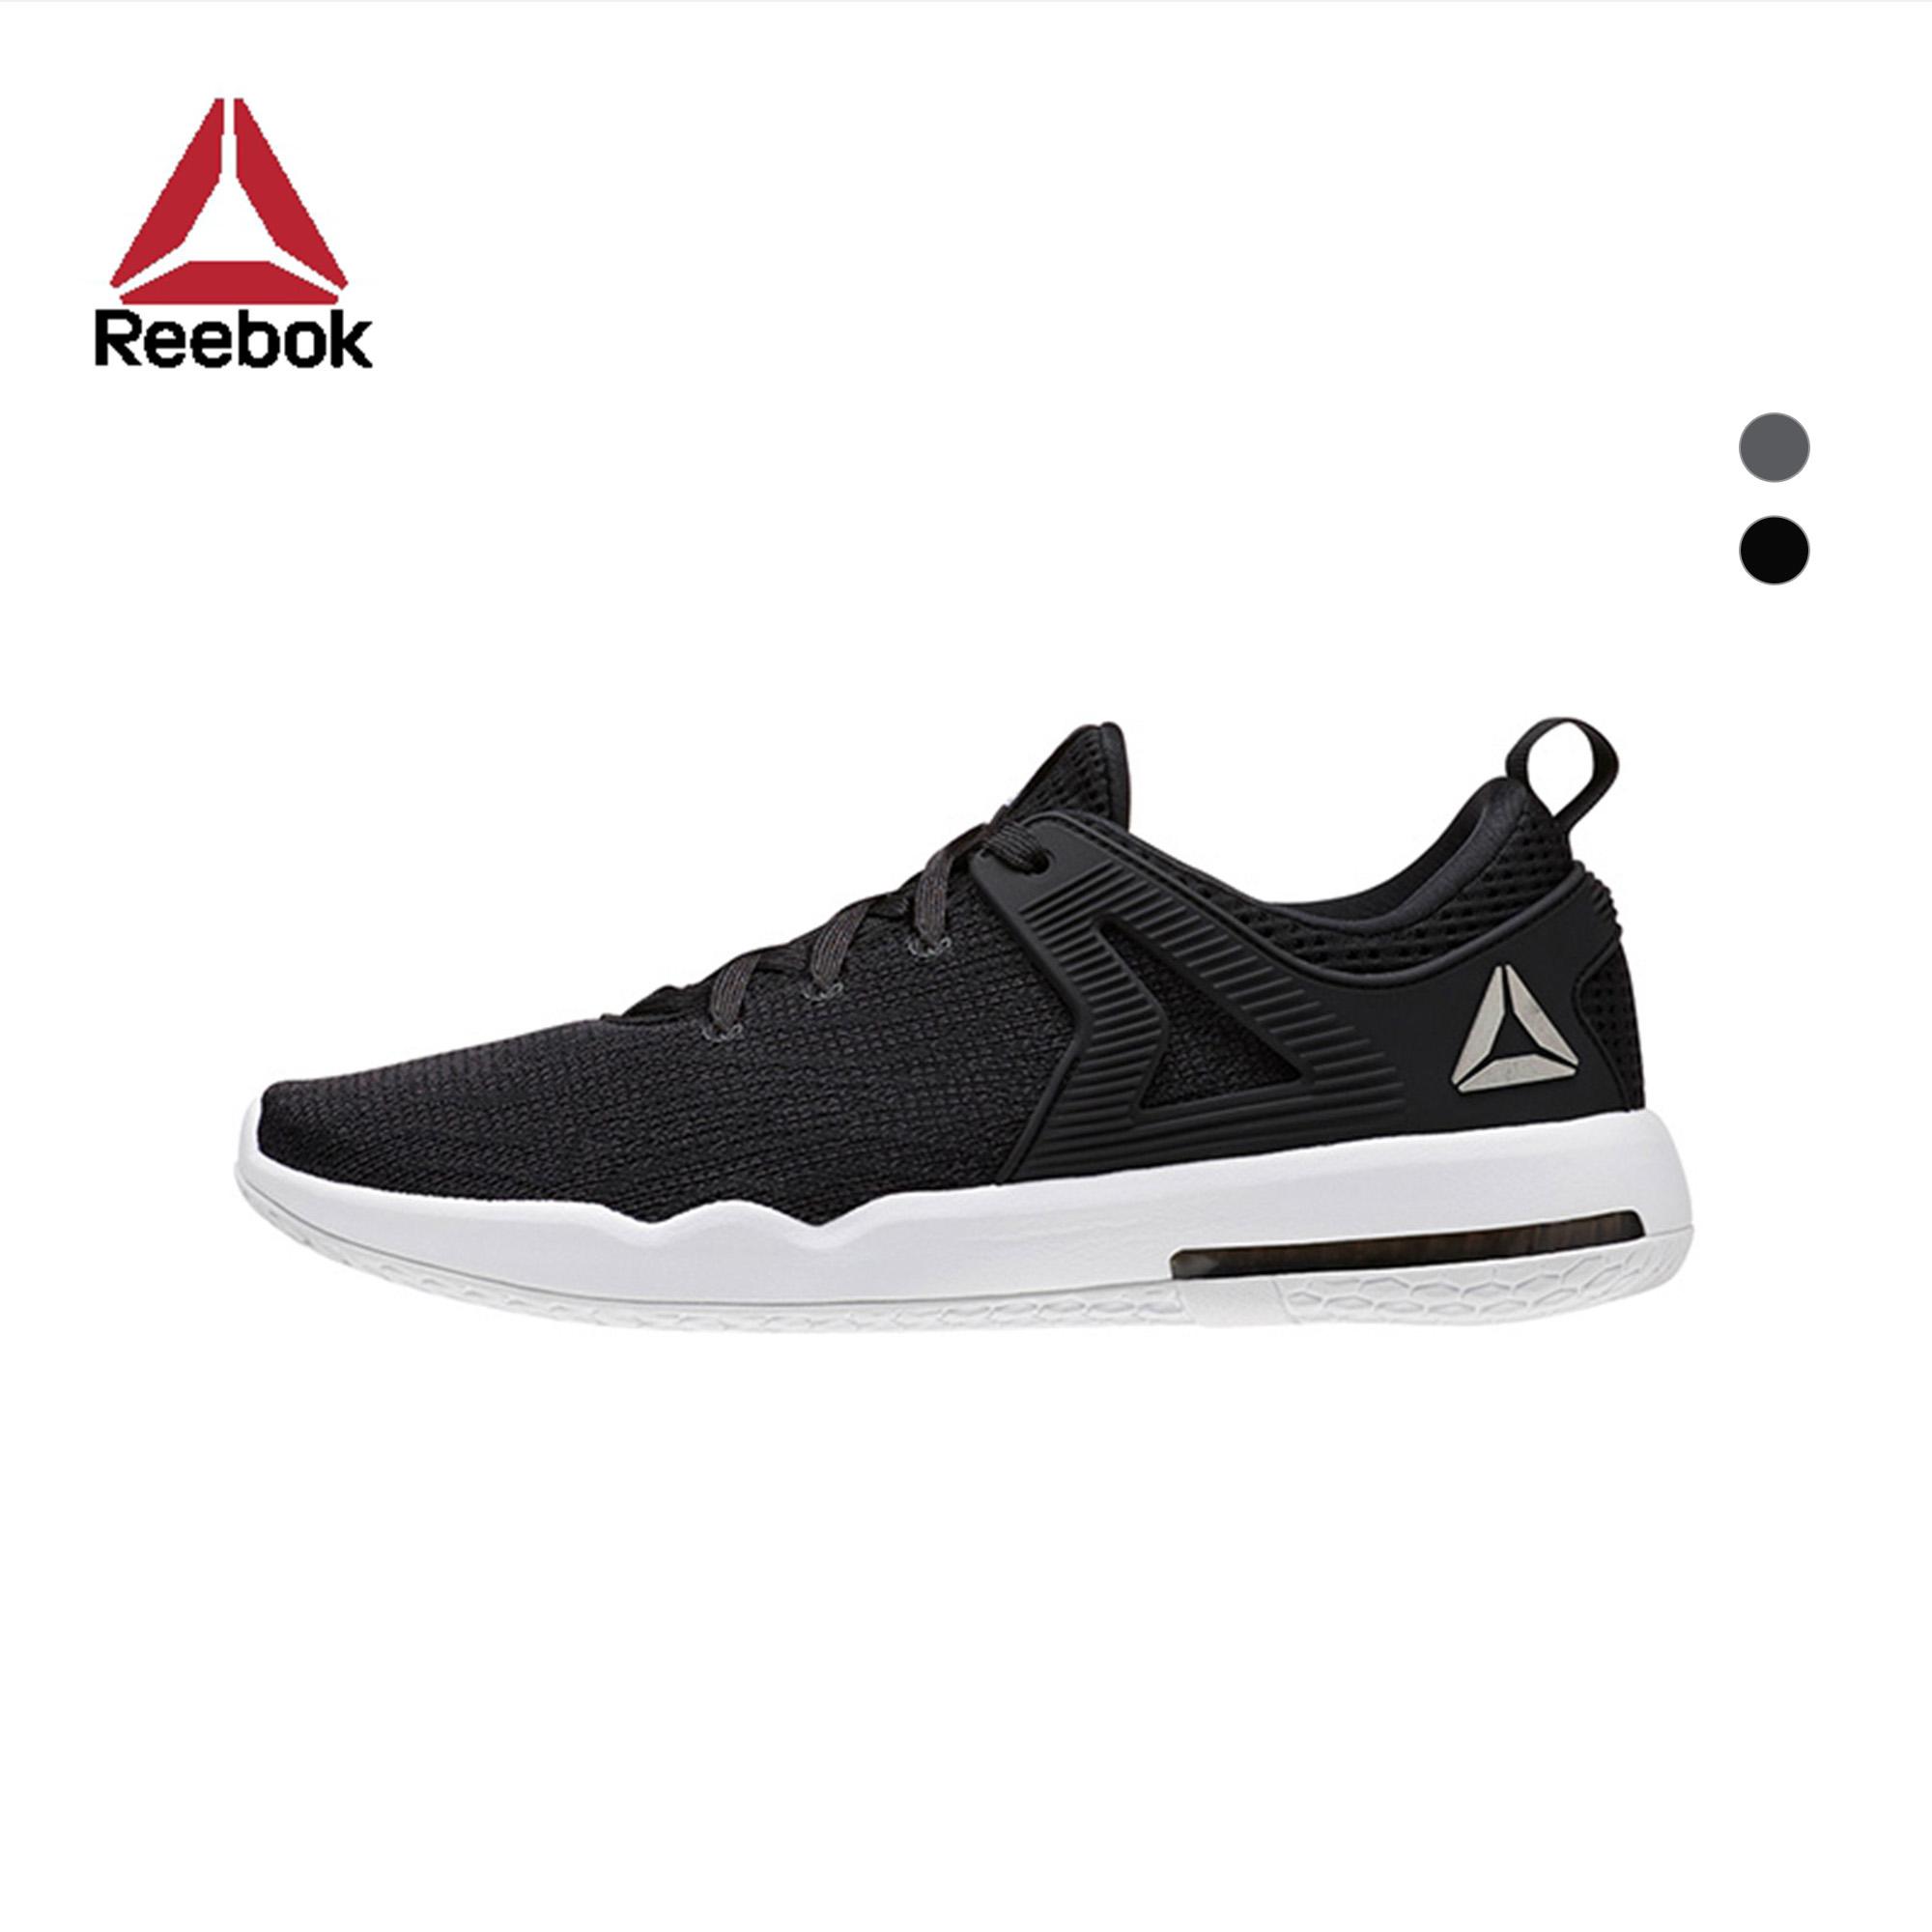 19b3edea5258 重复链接Reebok 锐步HEXALITE X GLIDE男子跑步鞋运动鞋AVR40-SGshop